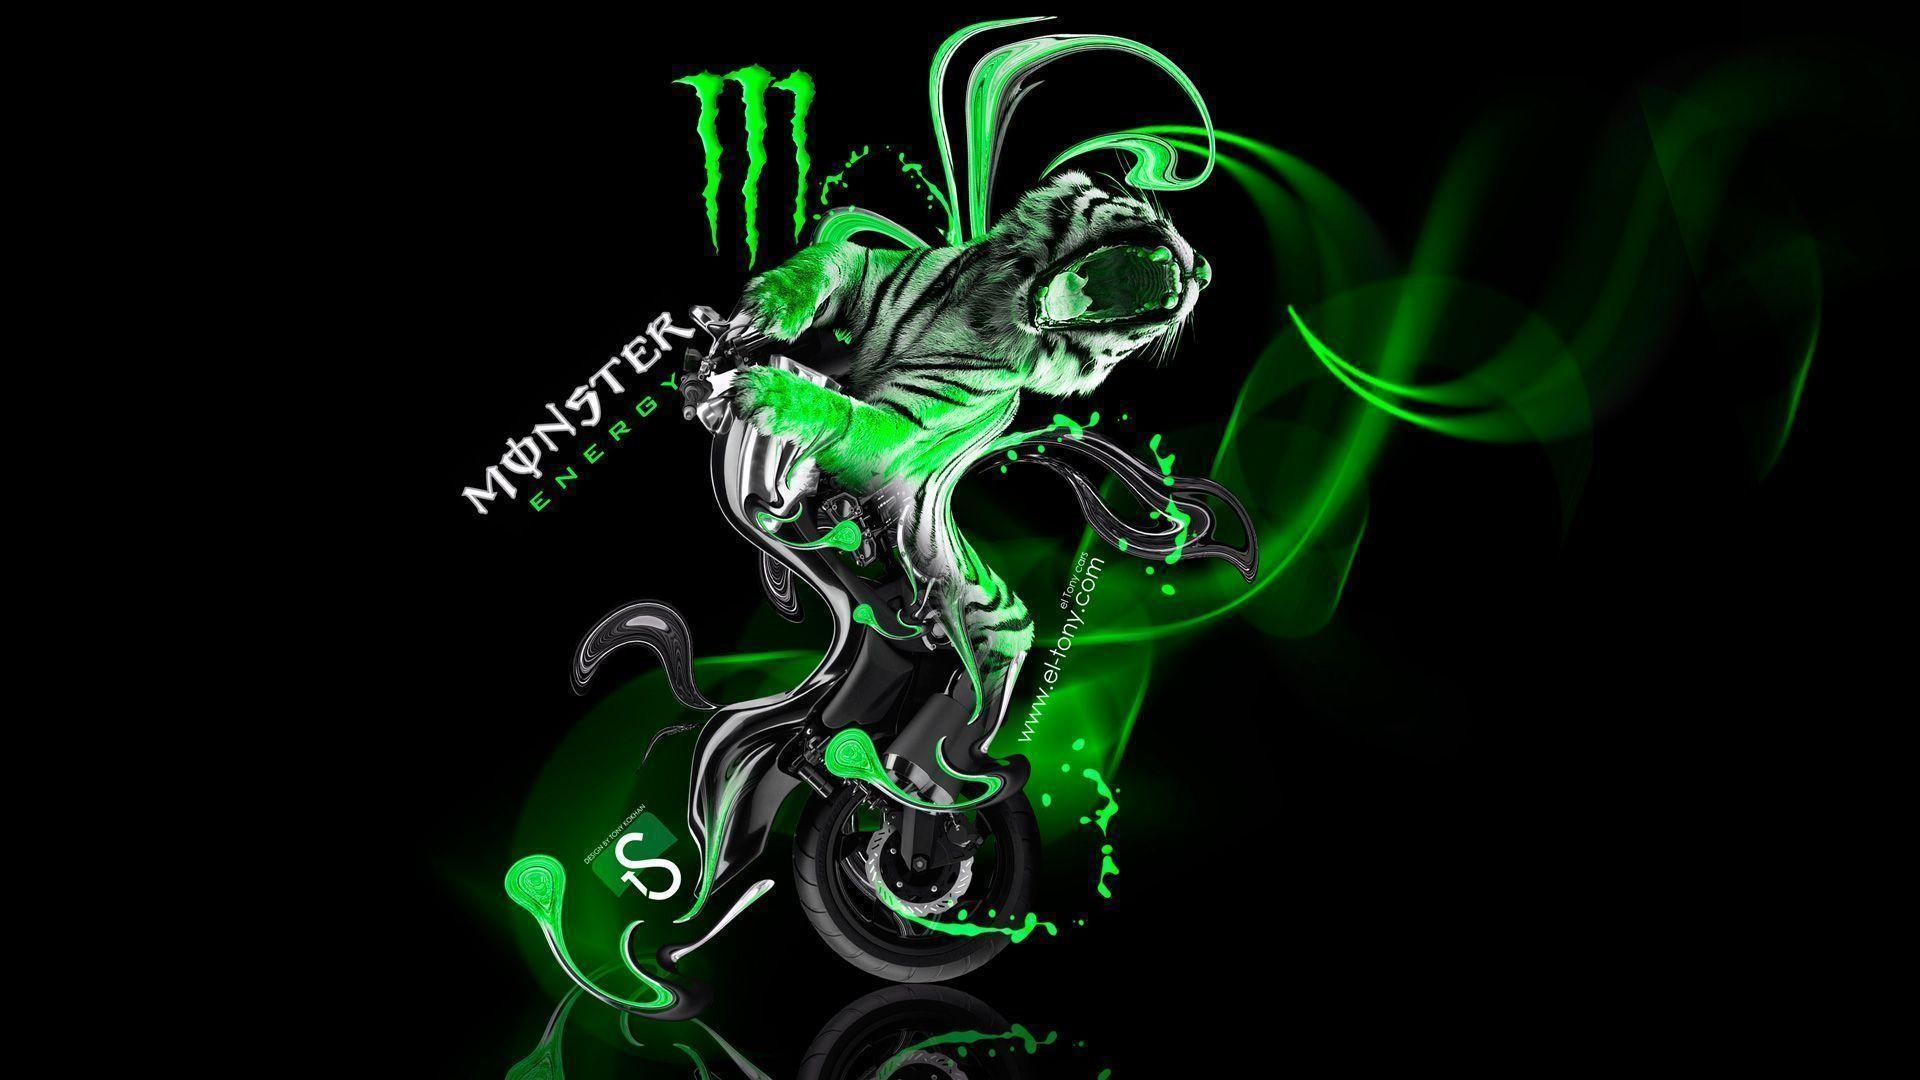 Superb 1920x1080 Monster Energy Kawasaki Ninja Green Plastic Bike Wallpapers Amazing Design